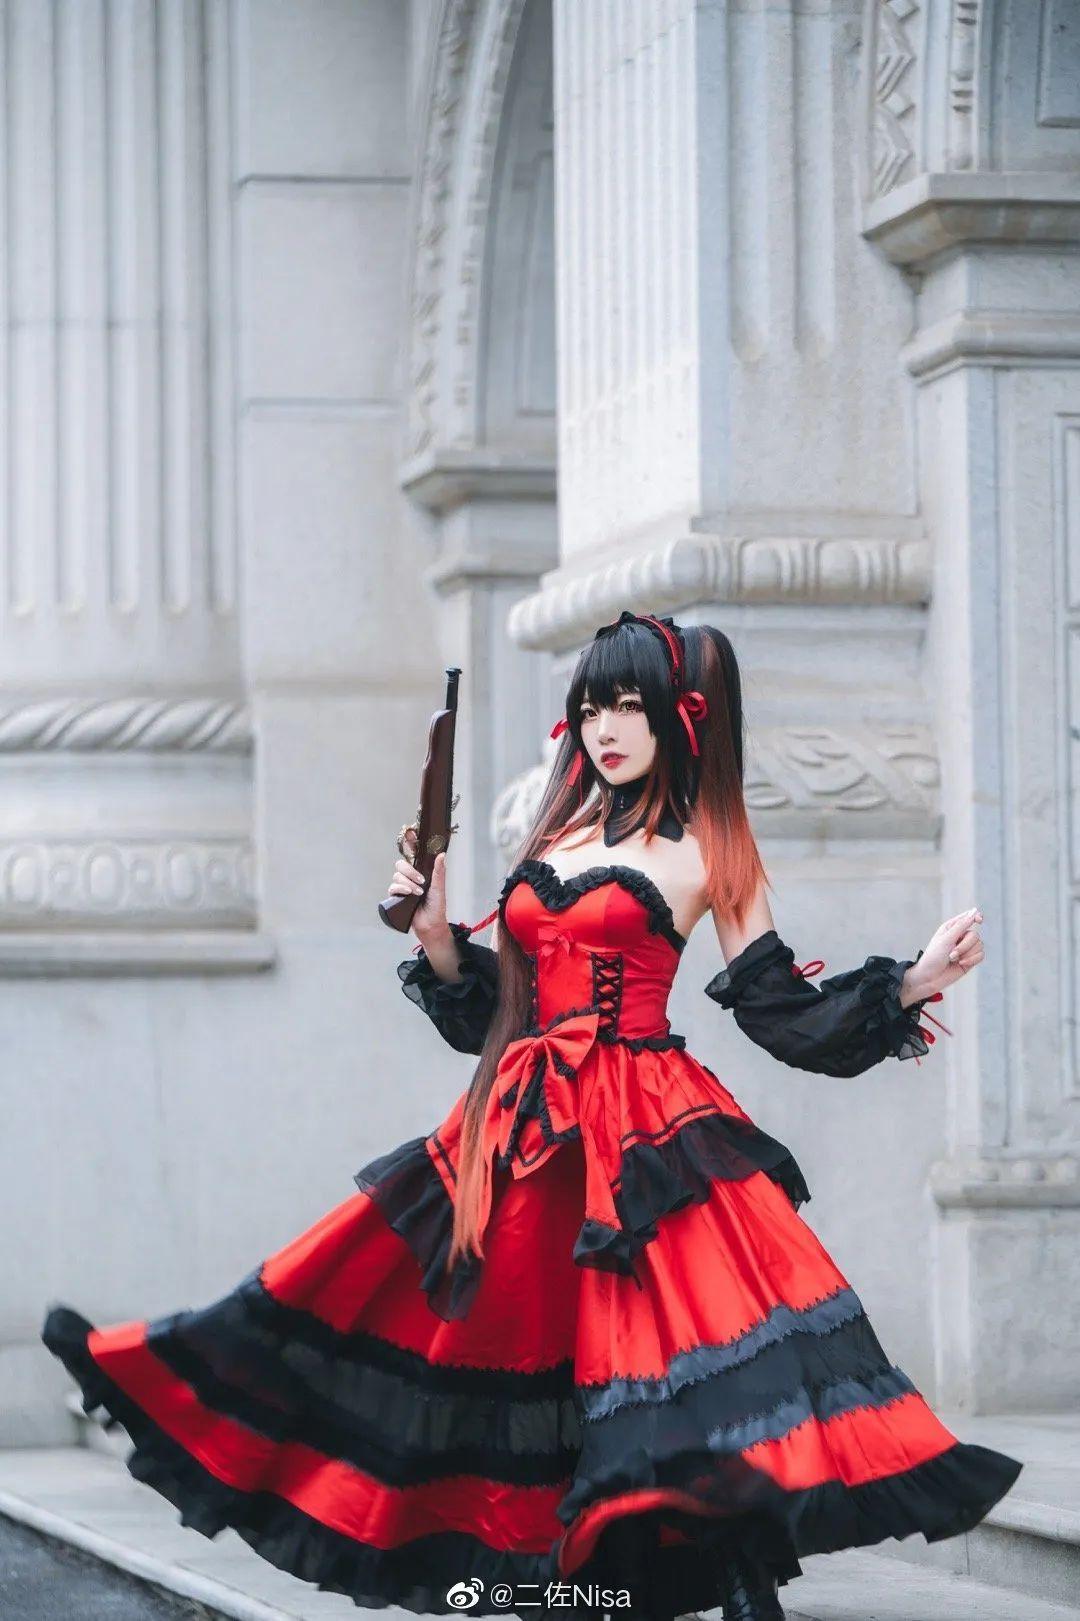 cosplay – 《约会大作战》时崎狂三,持枪的三三太A了 (cn:二佐Nisa)_图片 No.2